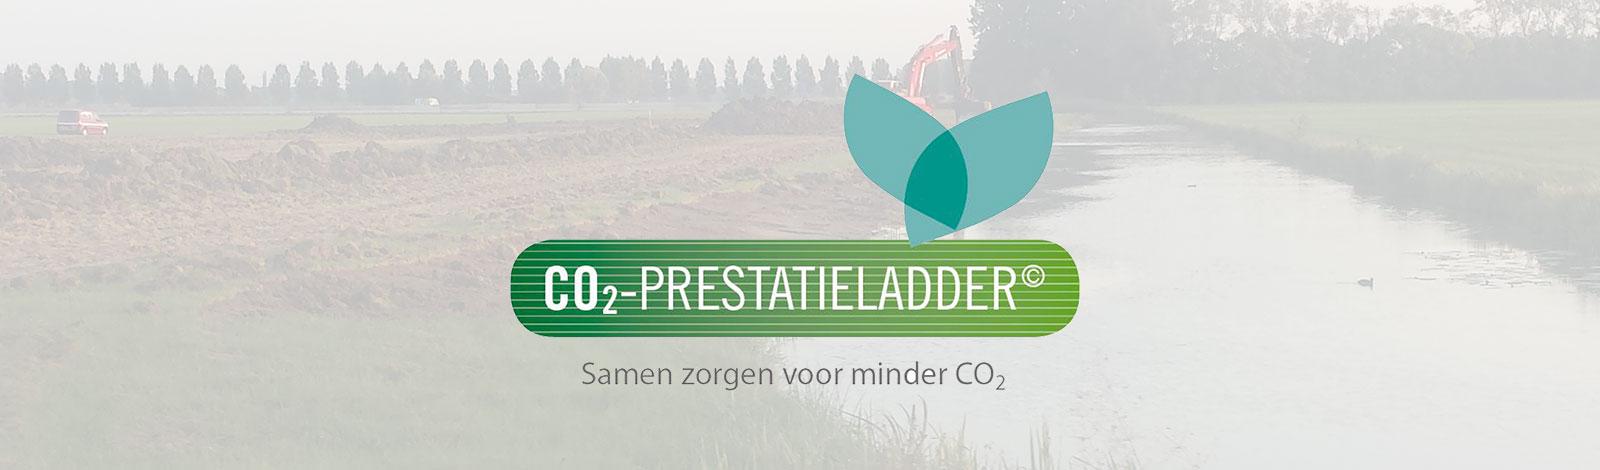 Sterk Heukelum - CO2 prestatieladder